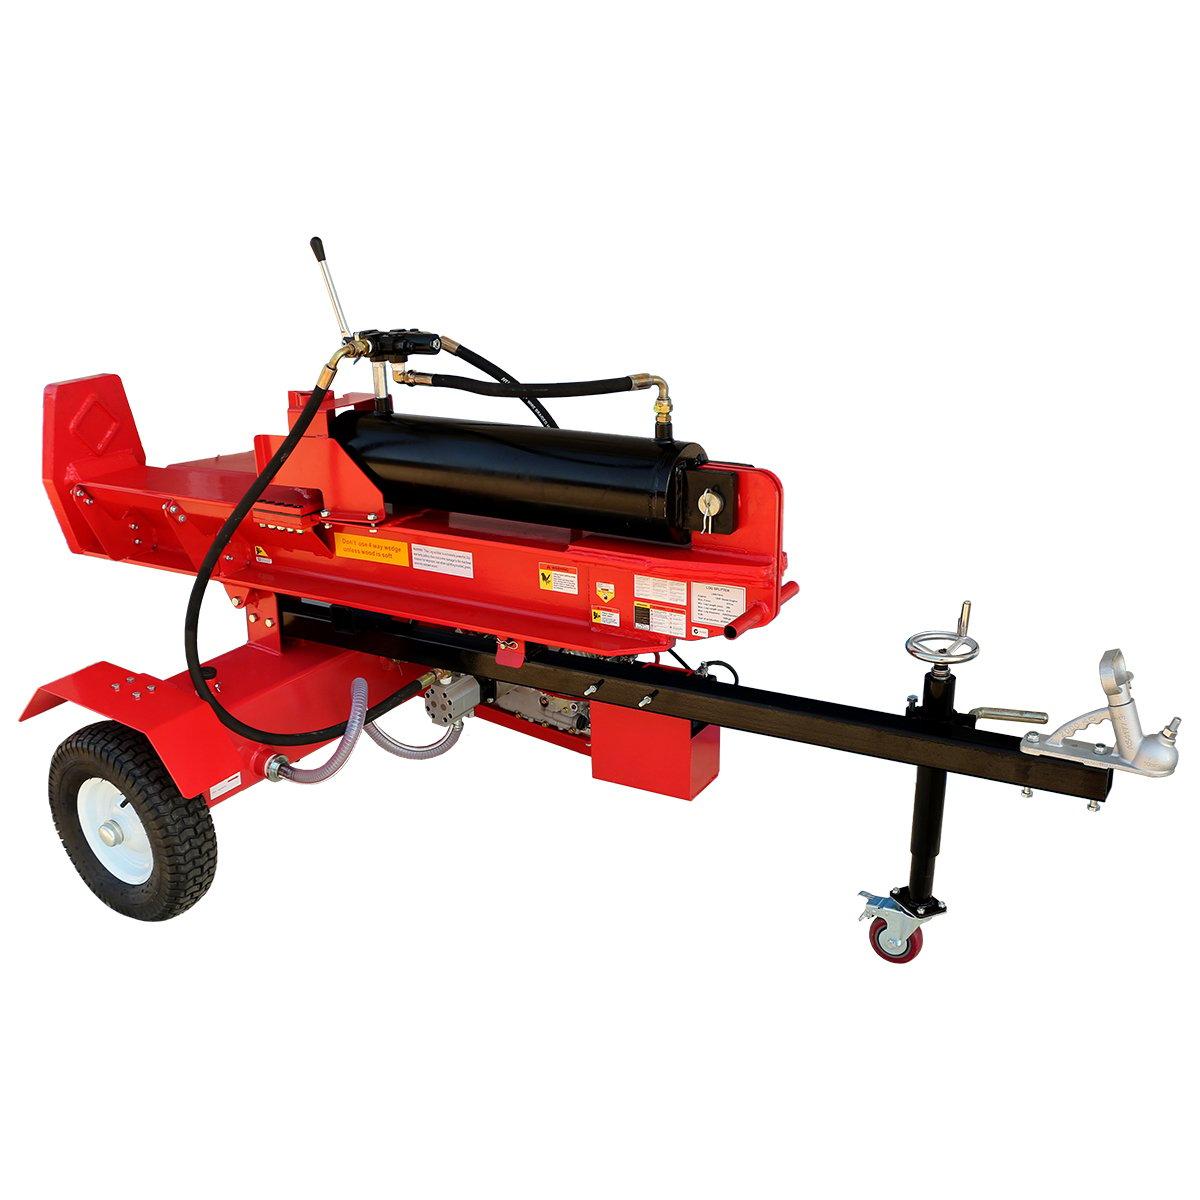 75 Ton Yukon Diesel Log Splitter Wood Cutter Axe Block